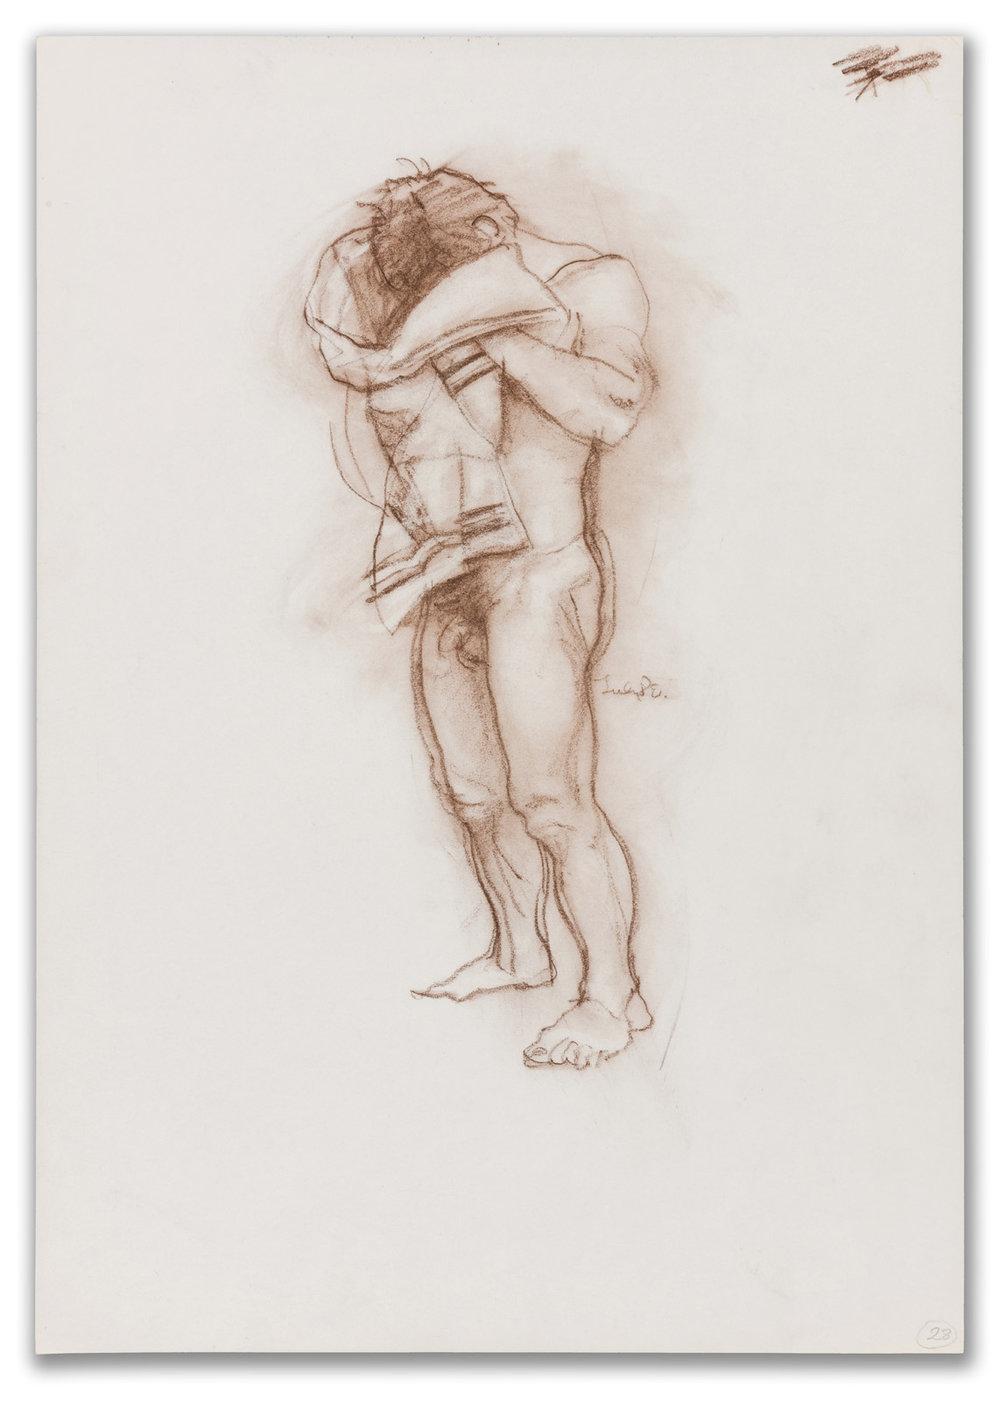 Michael Leonard, (British b.1933), Male Figure Study, July 1980.